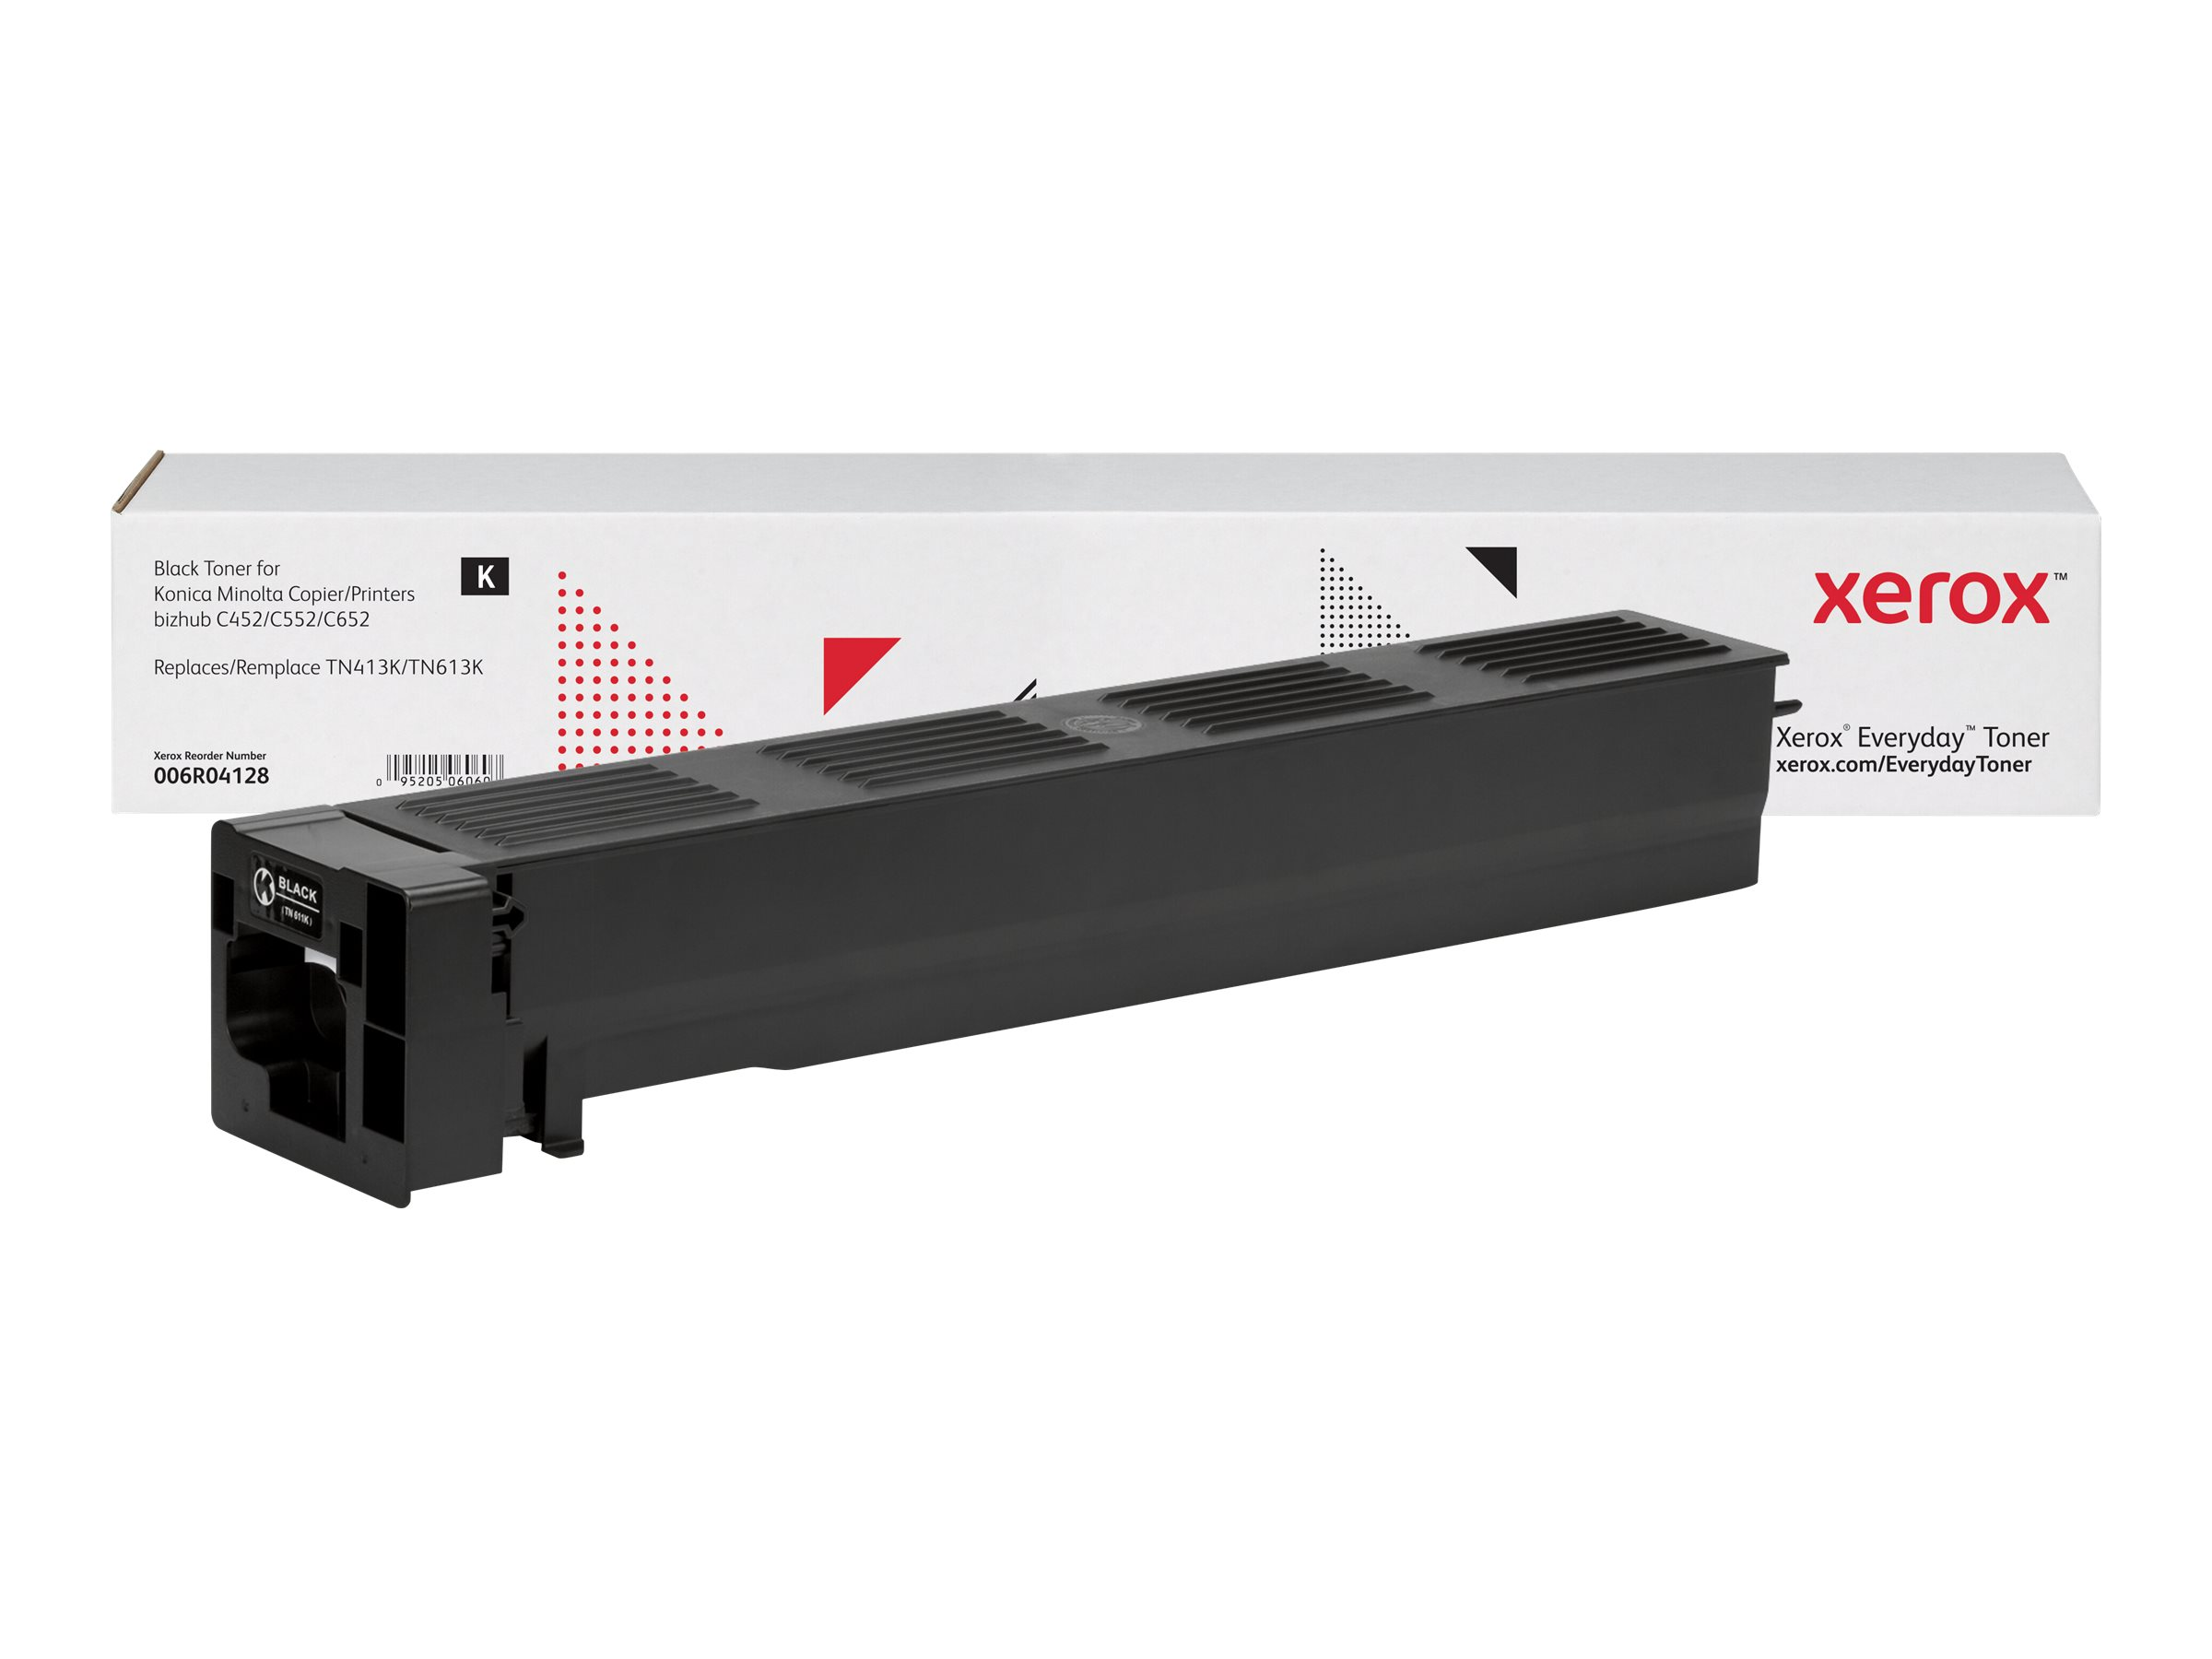 Xerox Everyday - black - toner cartridge (alternative for: Konica Minolta TN613K, Konica Minolta TN413K)